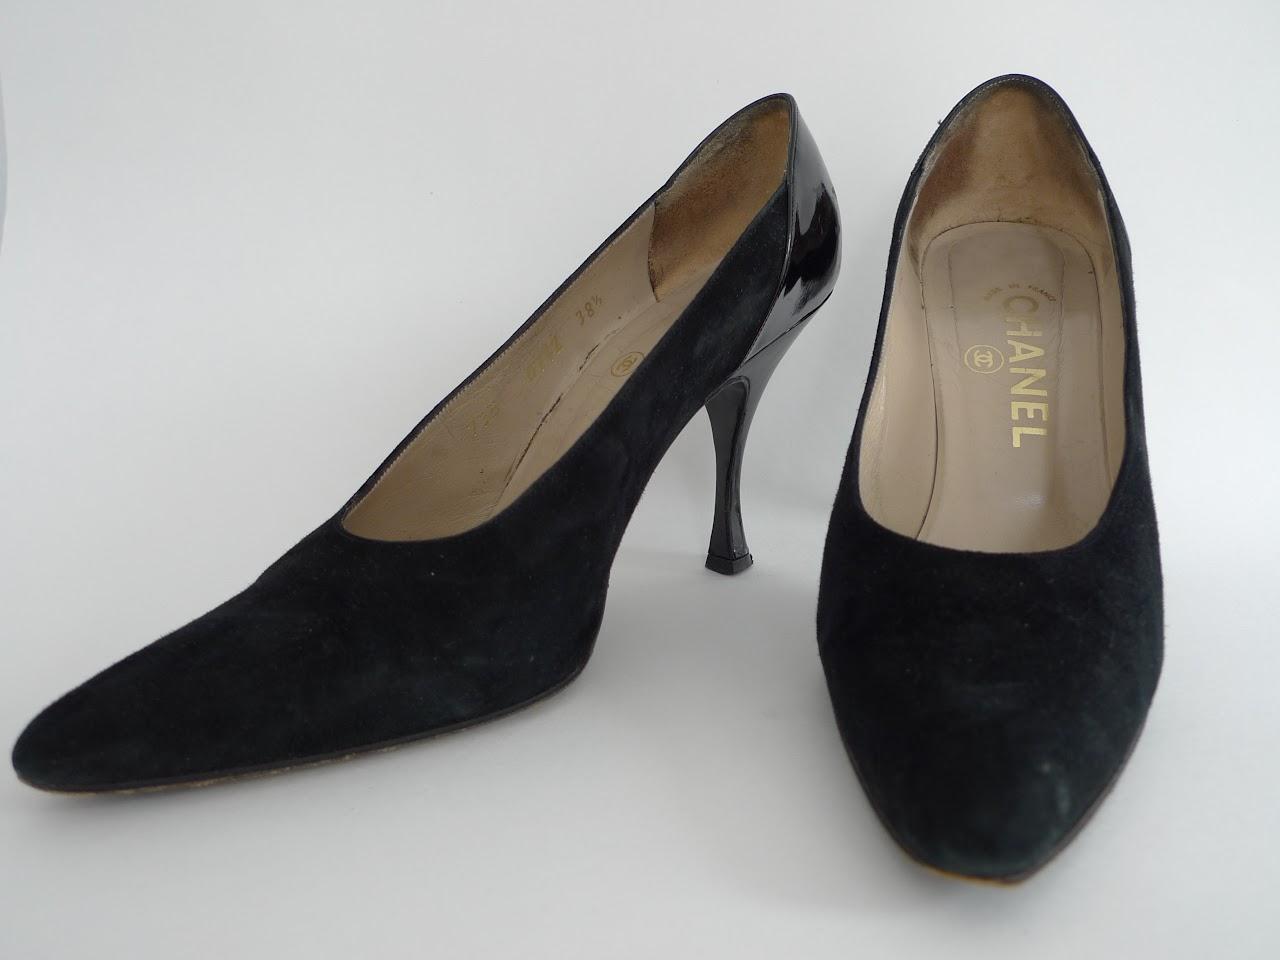 Chanel Black Suede Pumps